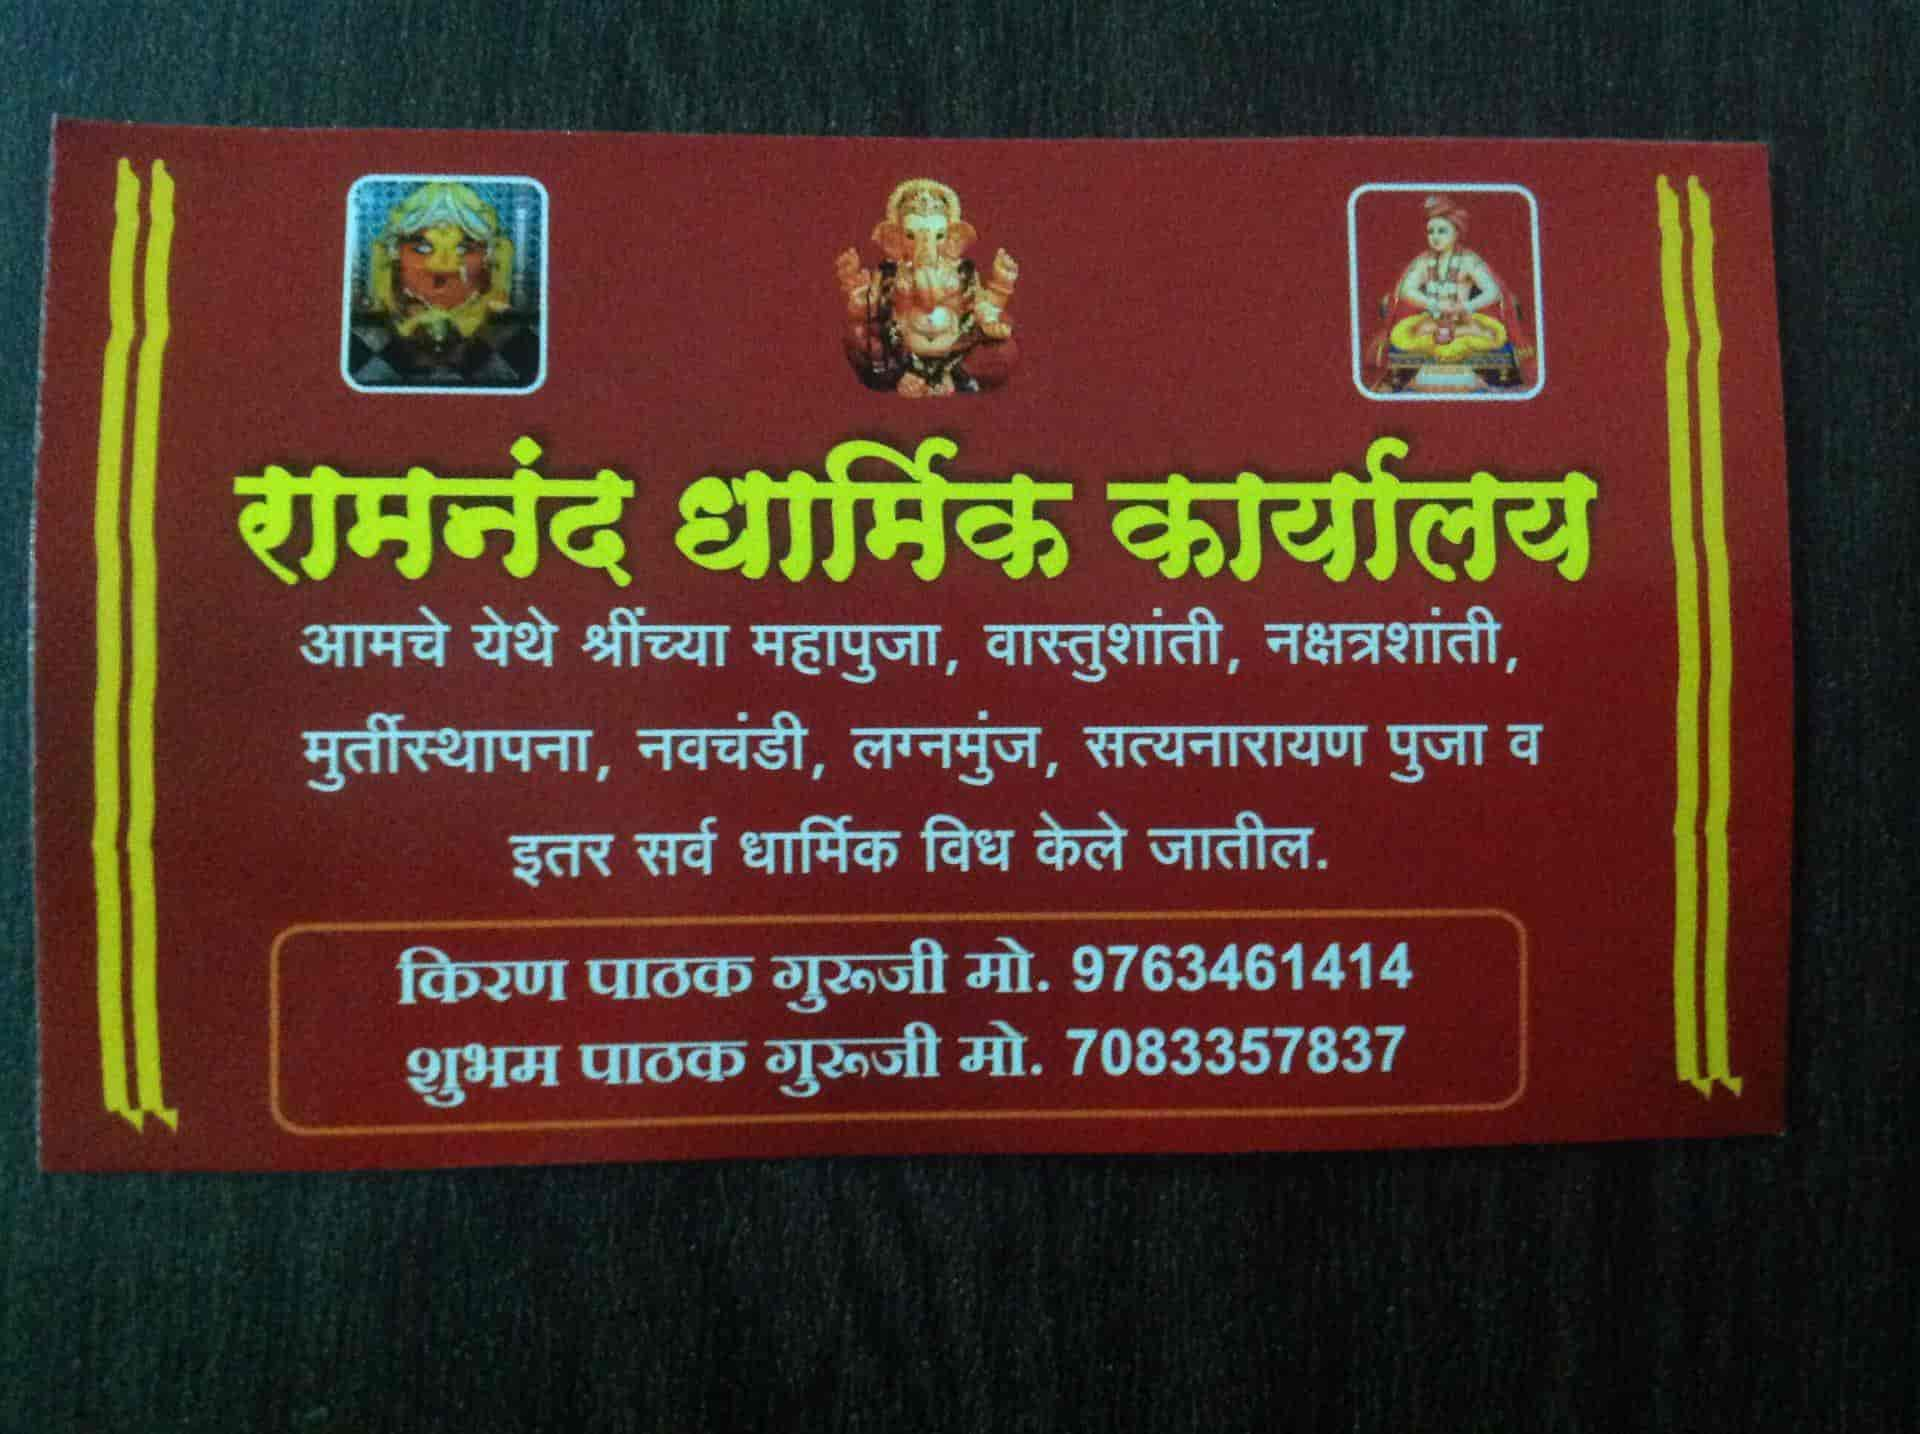 Ramanand guruji astrologer online